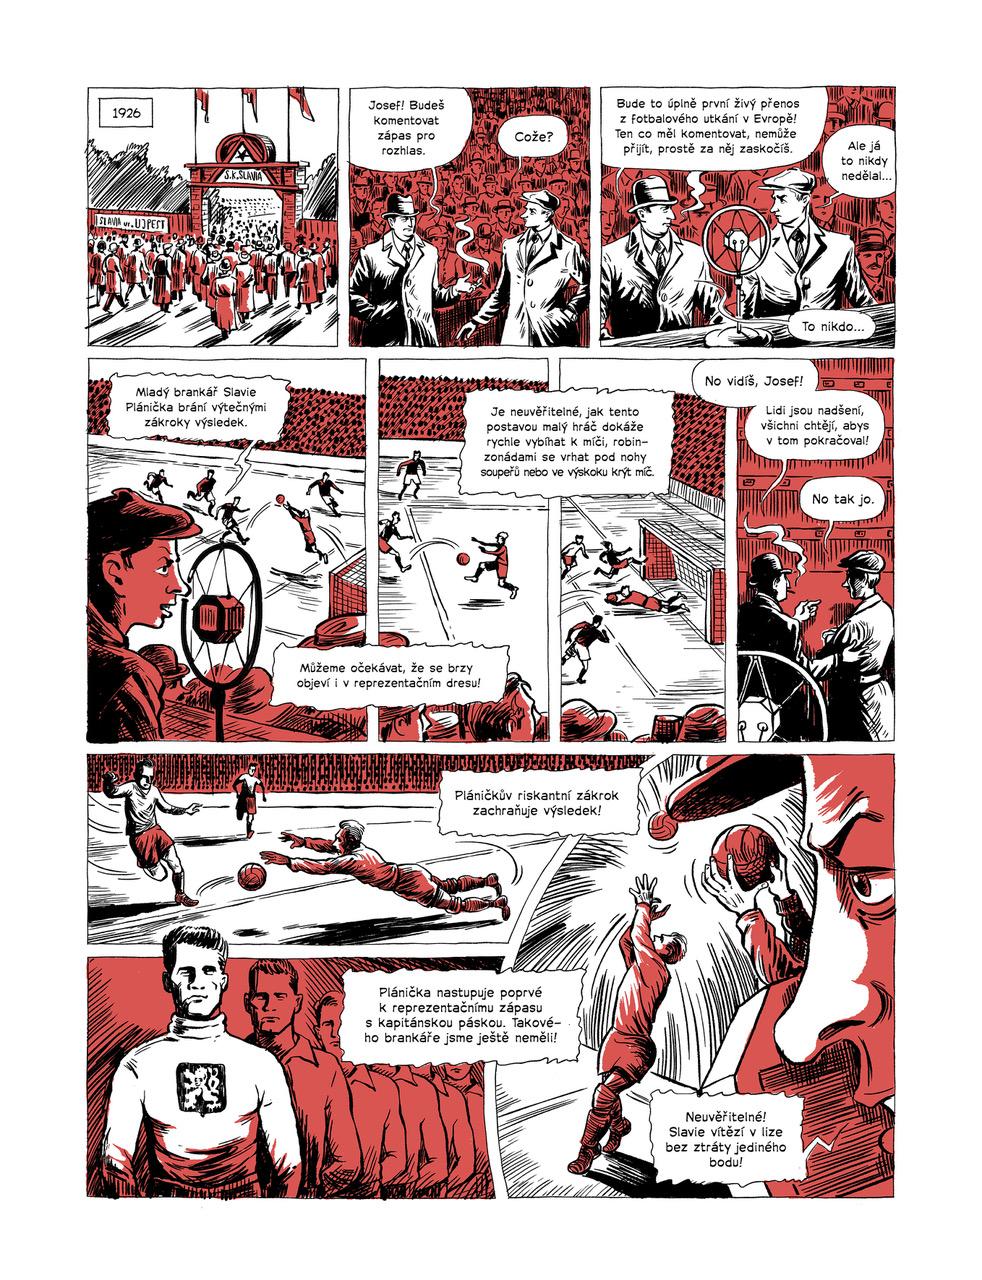 Komiks o Františku Pláničkovi. Foto: Yinachi